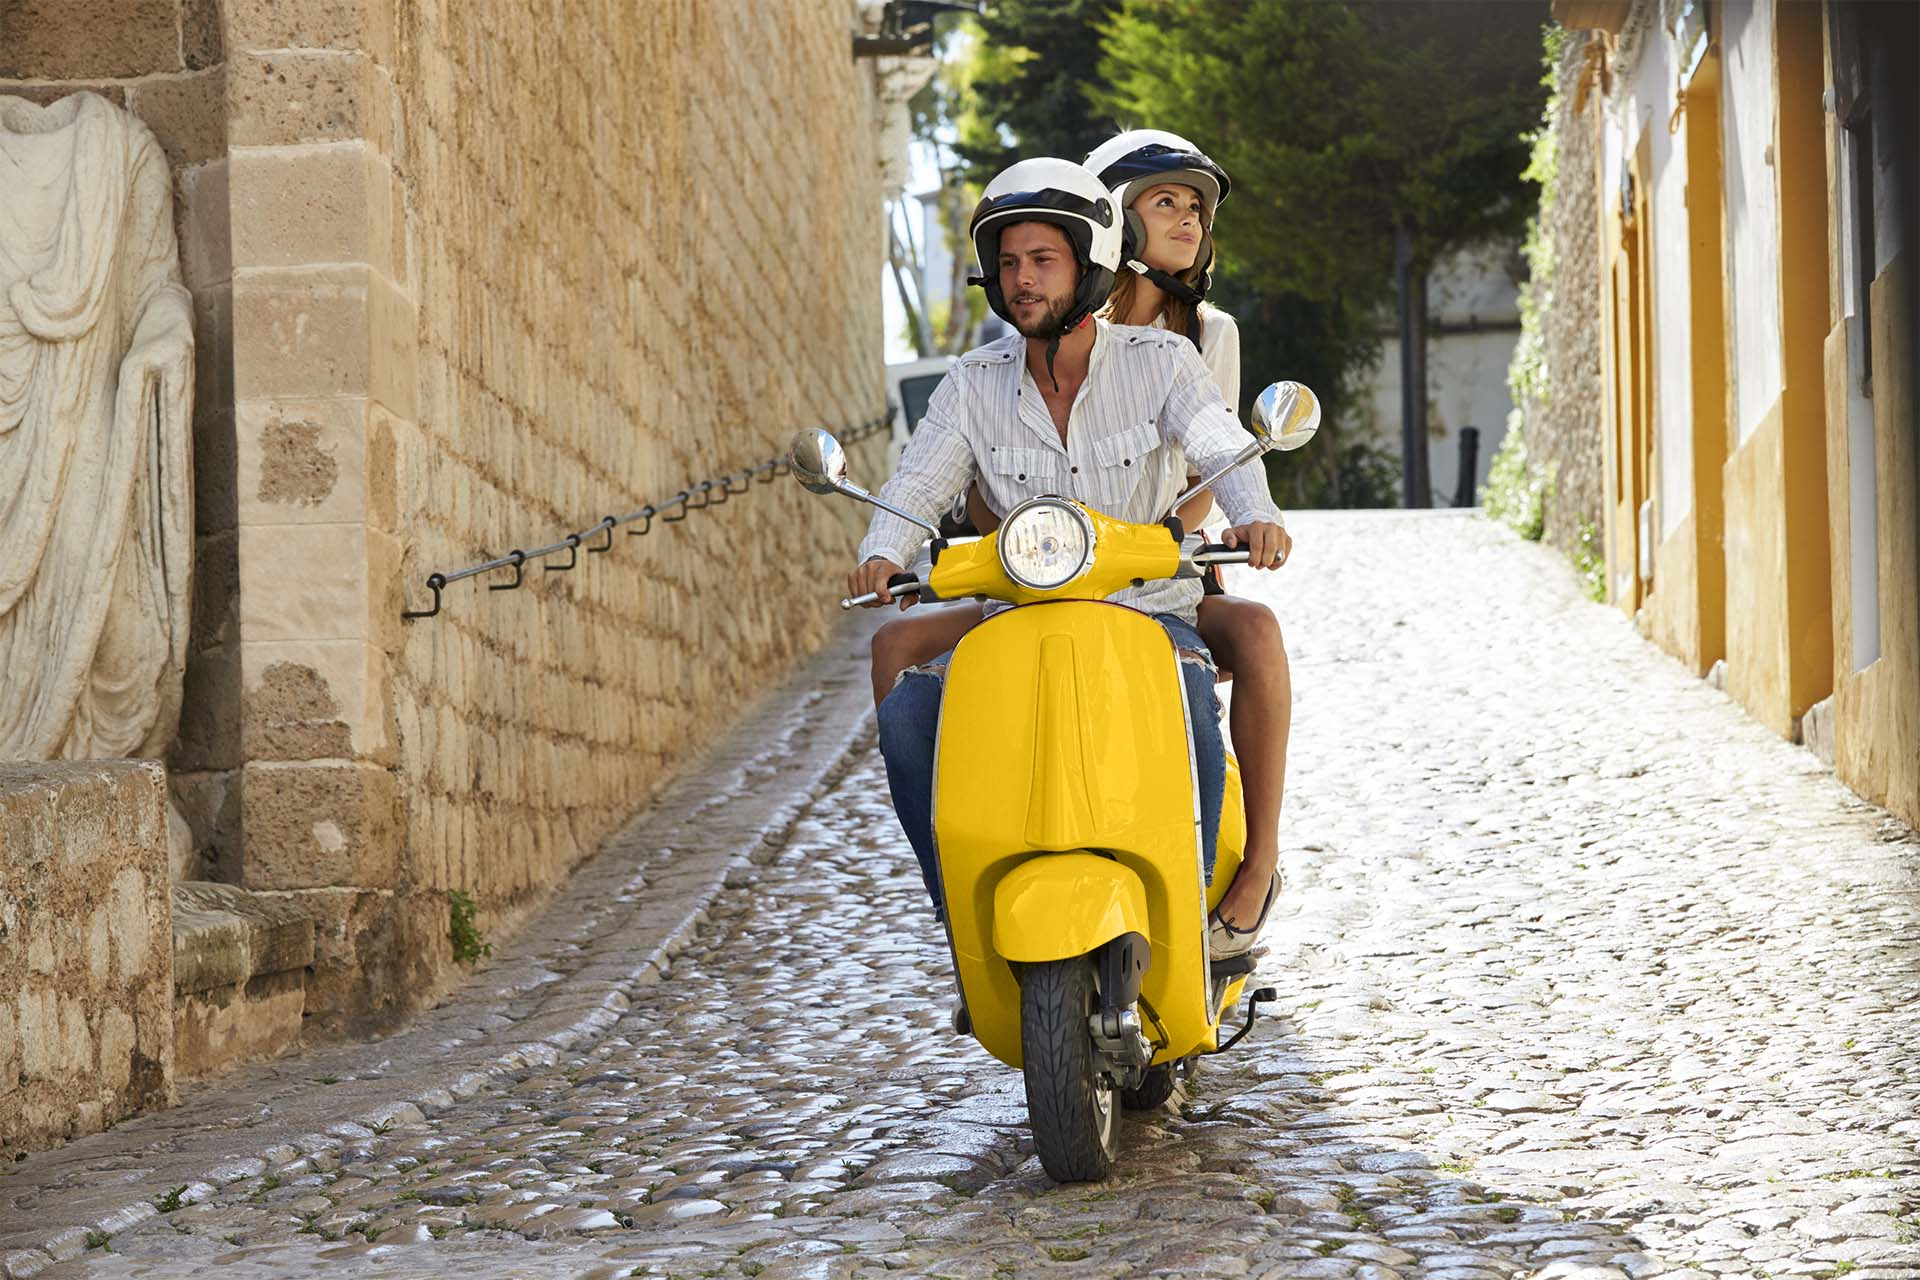 mann og dame på gul scooter i gate med brostein